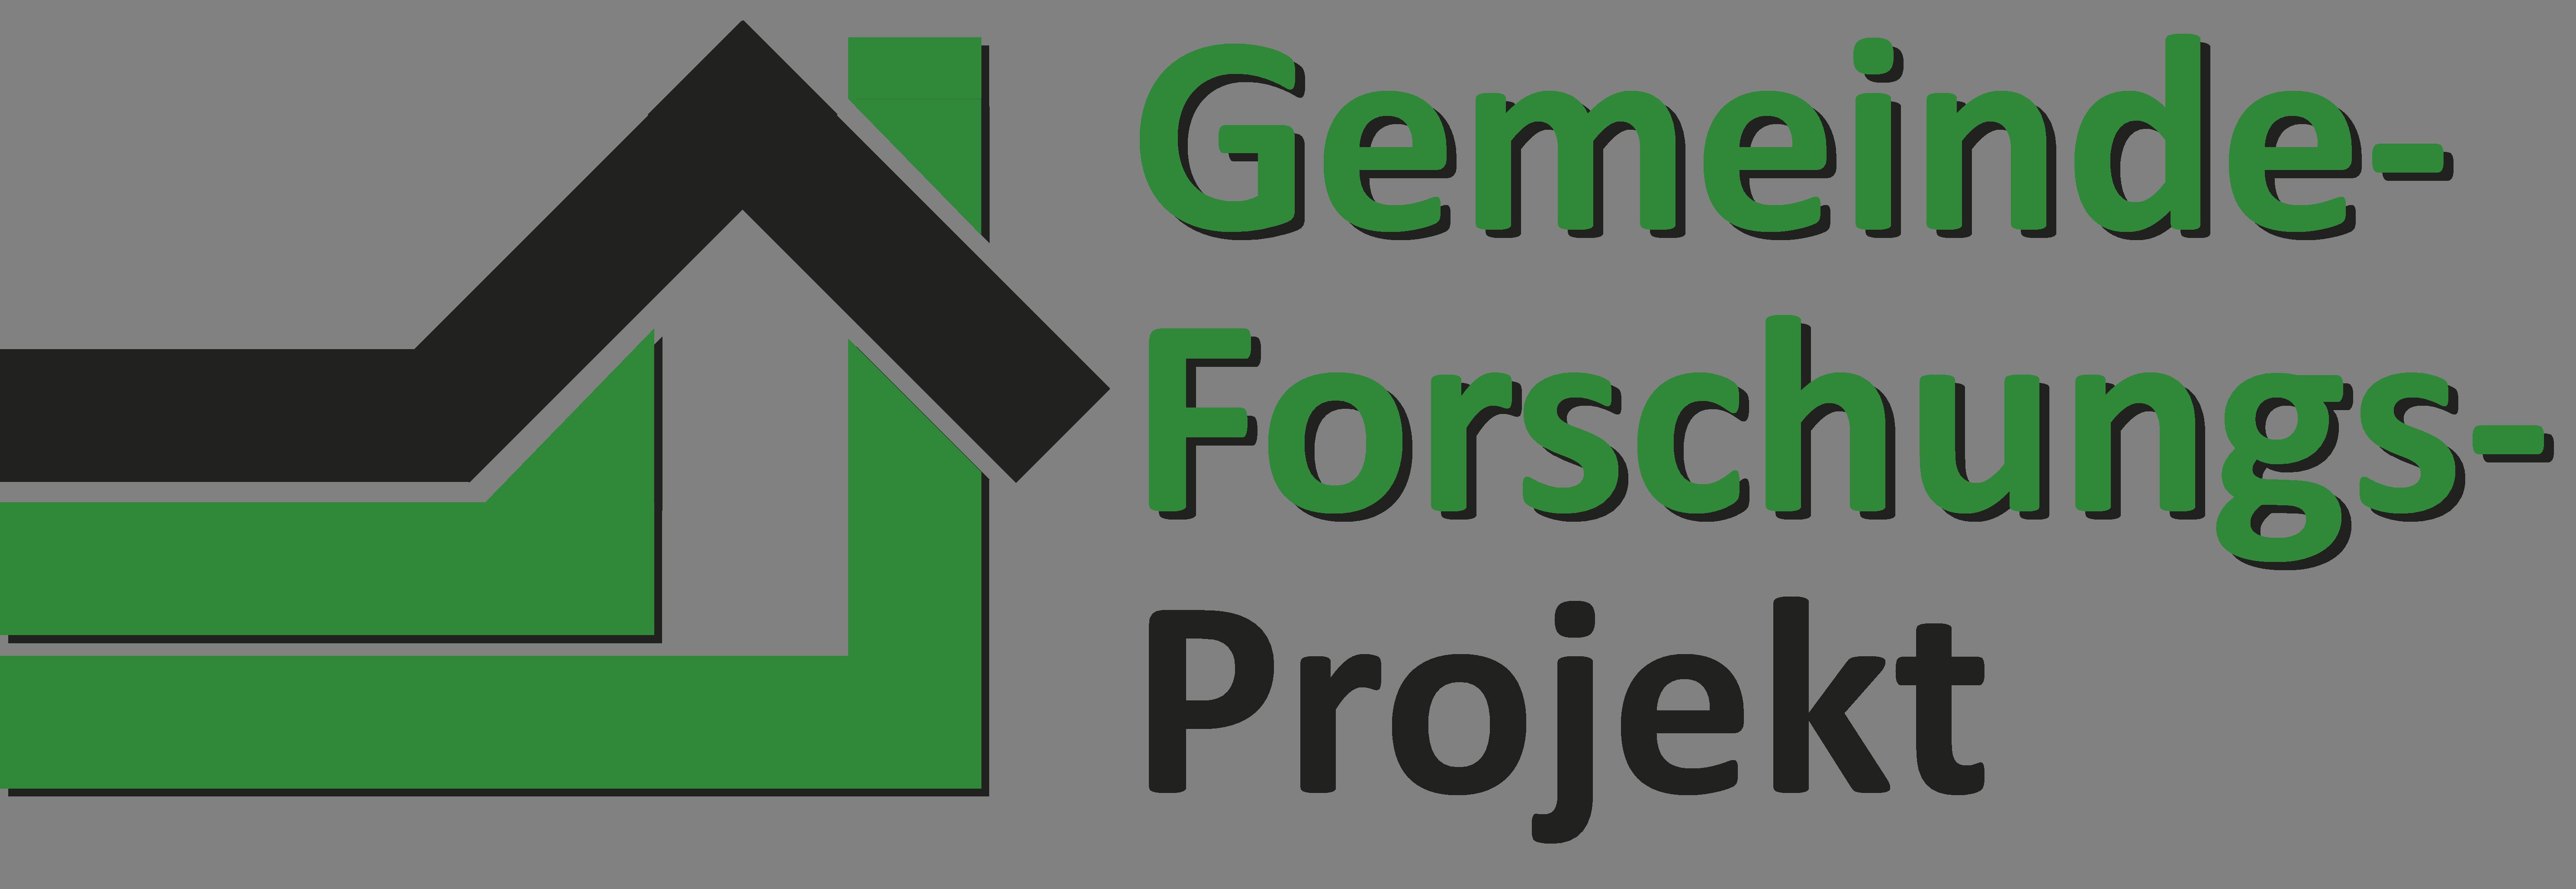 Logo GFP Löw 2x6 kurz